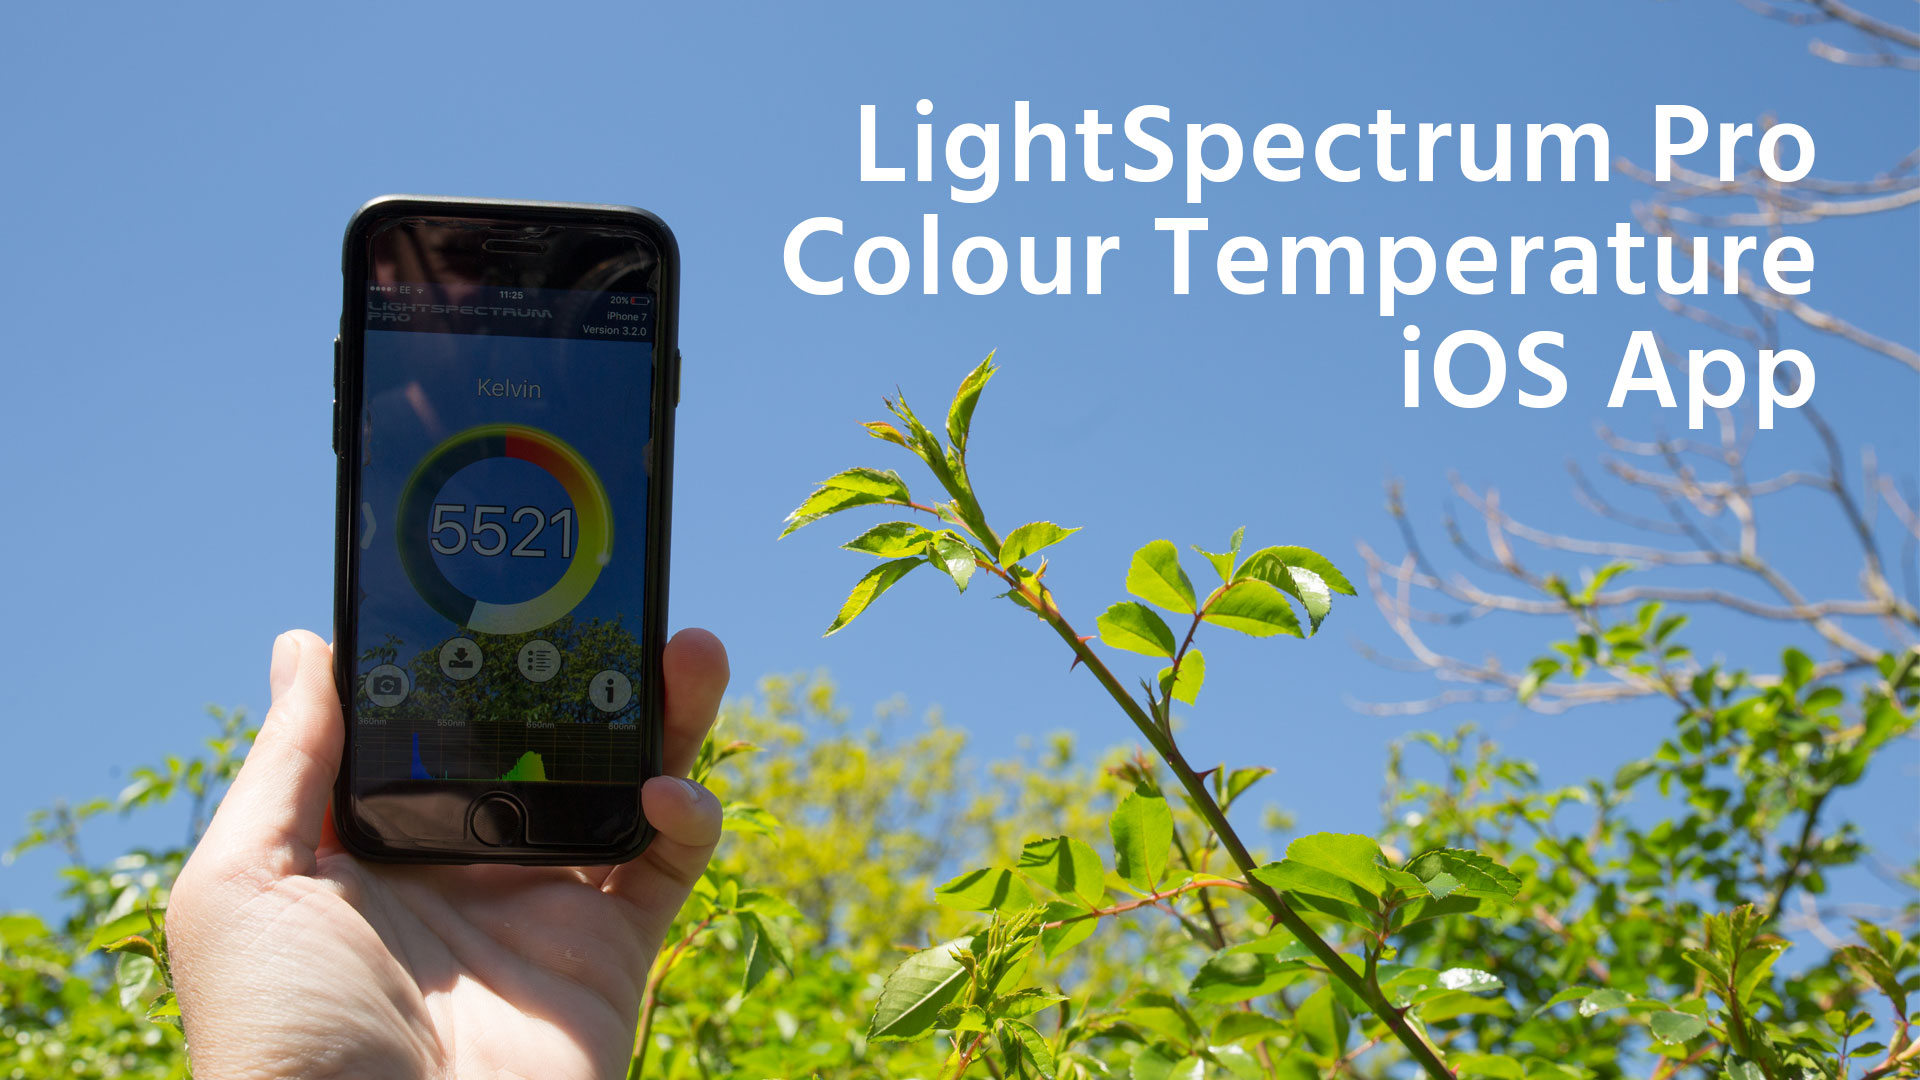 LightSpectrum Pro App - 色温度を簡単に計測するアプリ